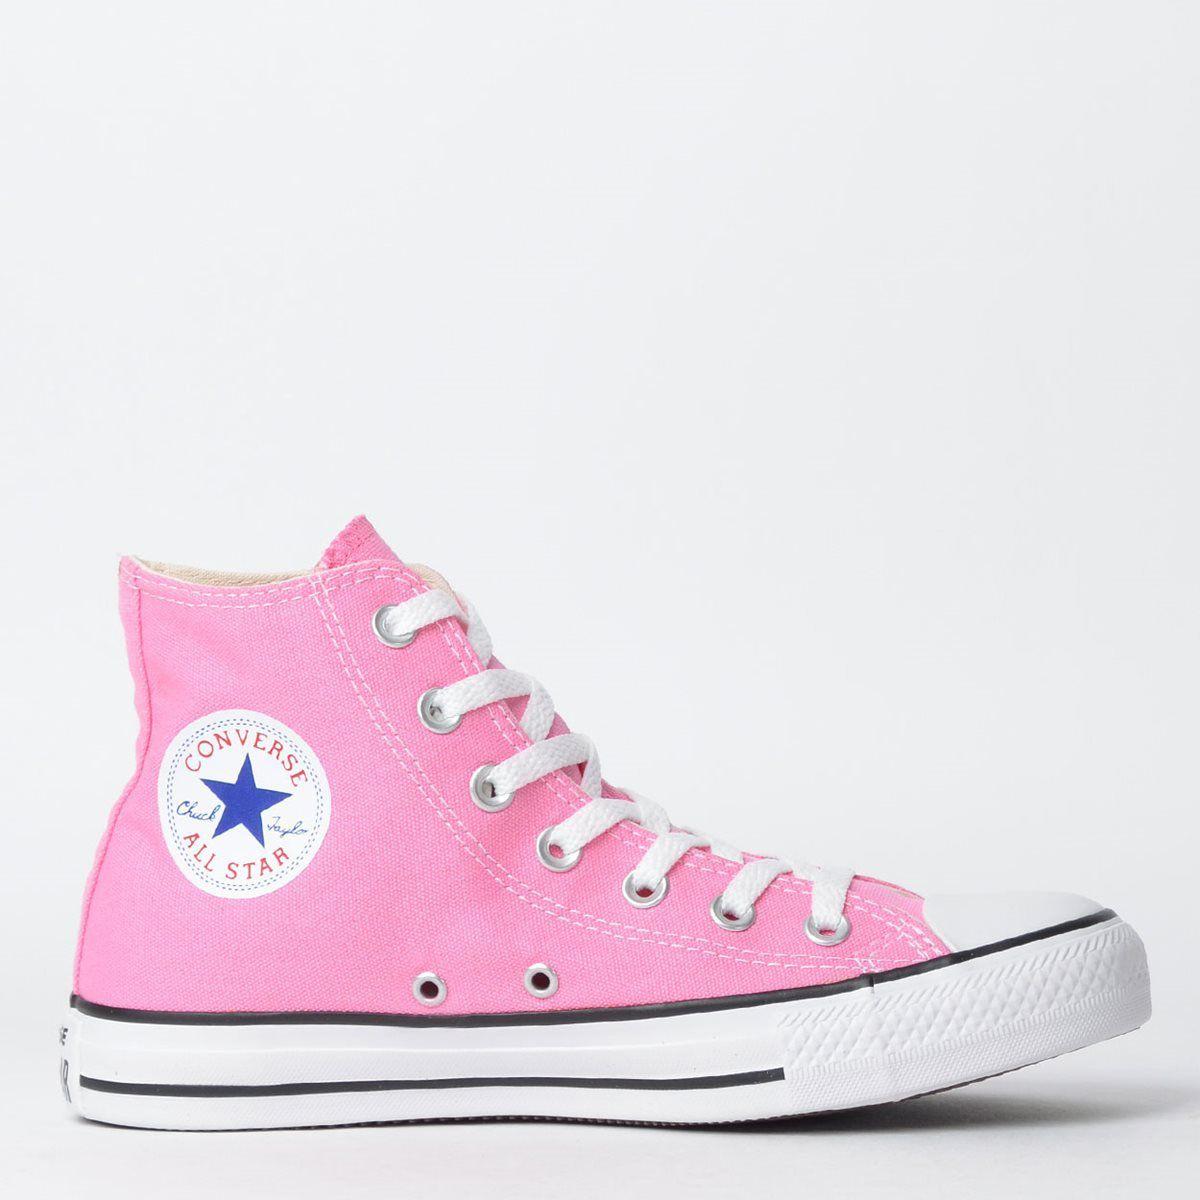 Tênis Converse Chuck Taylor All Star Rosa/Cru/Preto